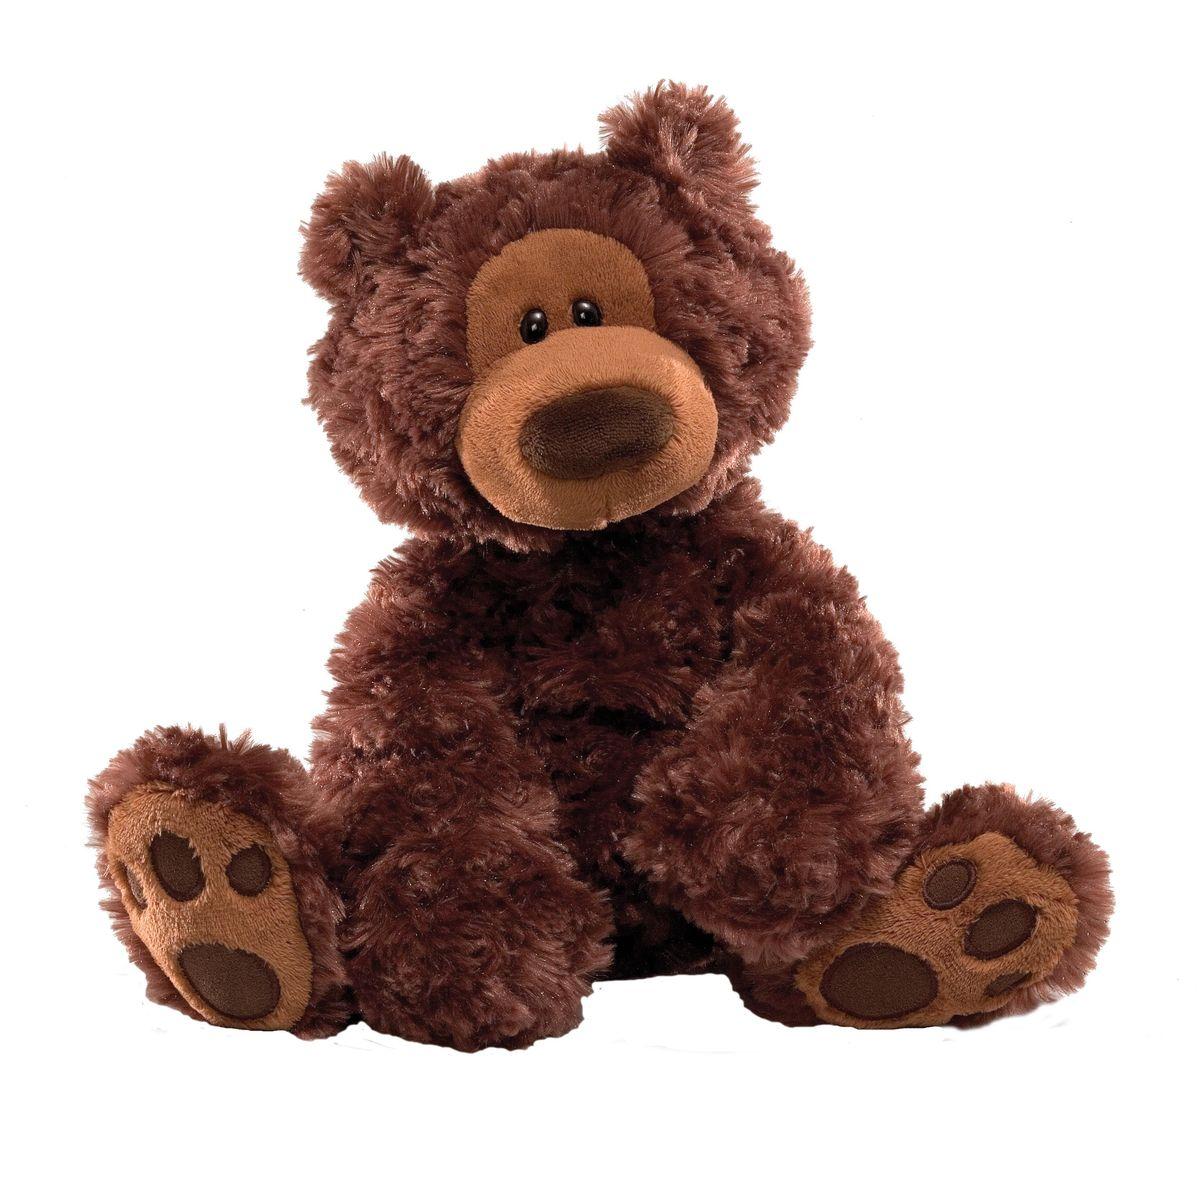 Gund Мягкая игрушка Philbin Bear Chocolate 33 см малышарики мягкая игрушка собака бассет хаунд 23 см